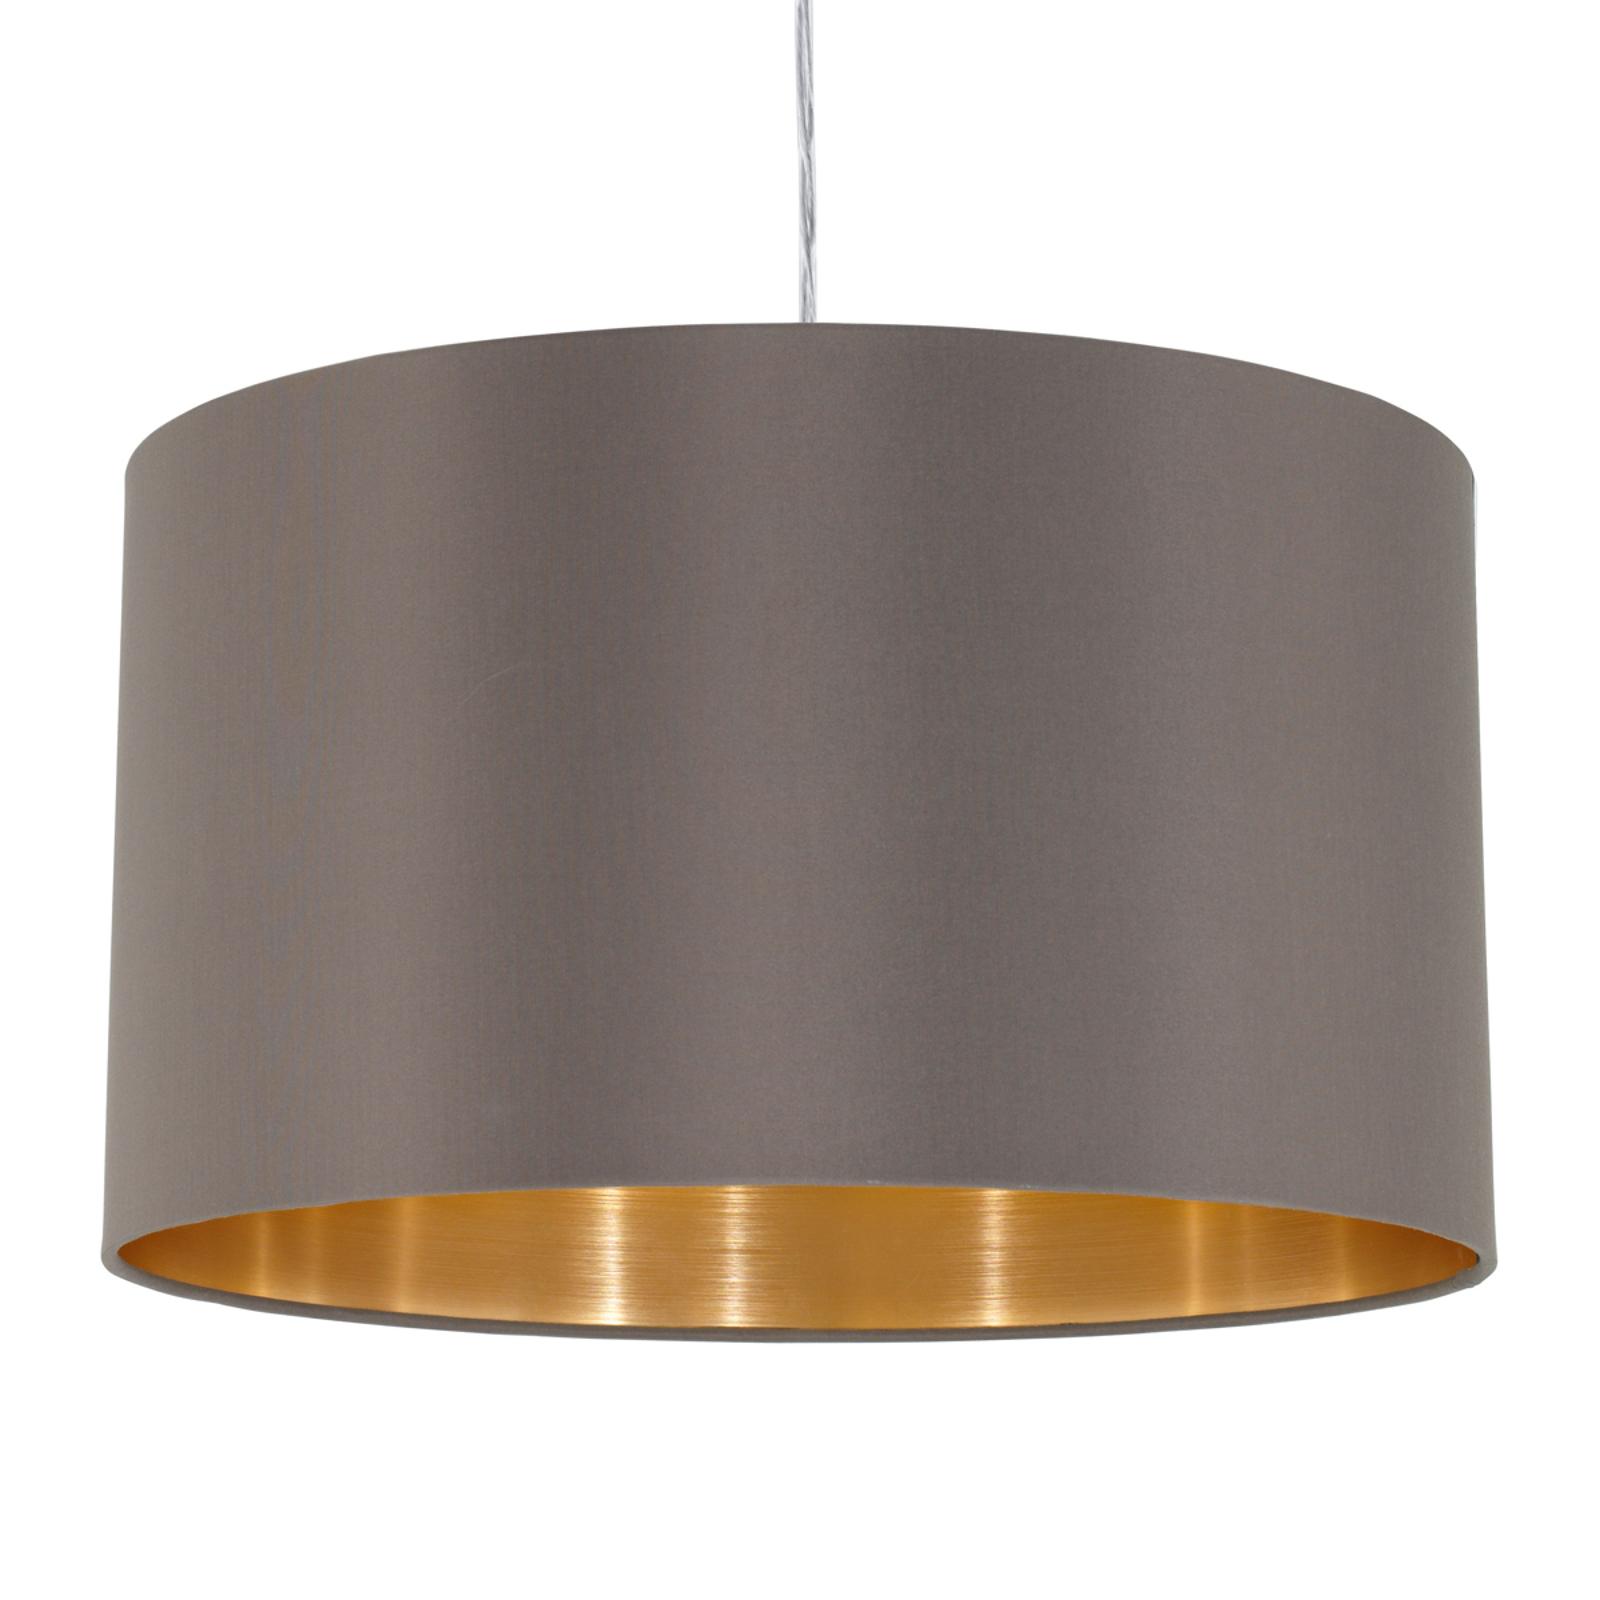 Tekstylna lampa wisząca Maserlo, cappuccino, 38 cm